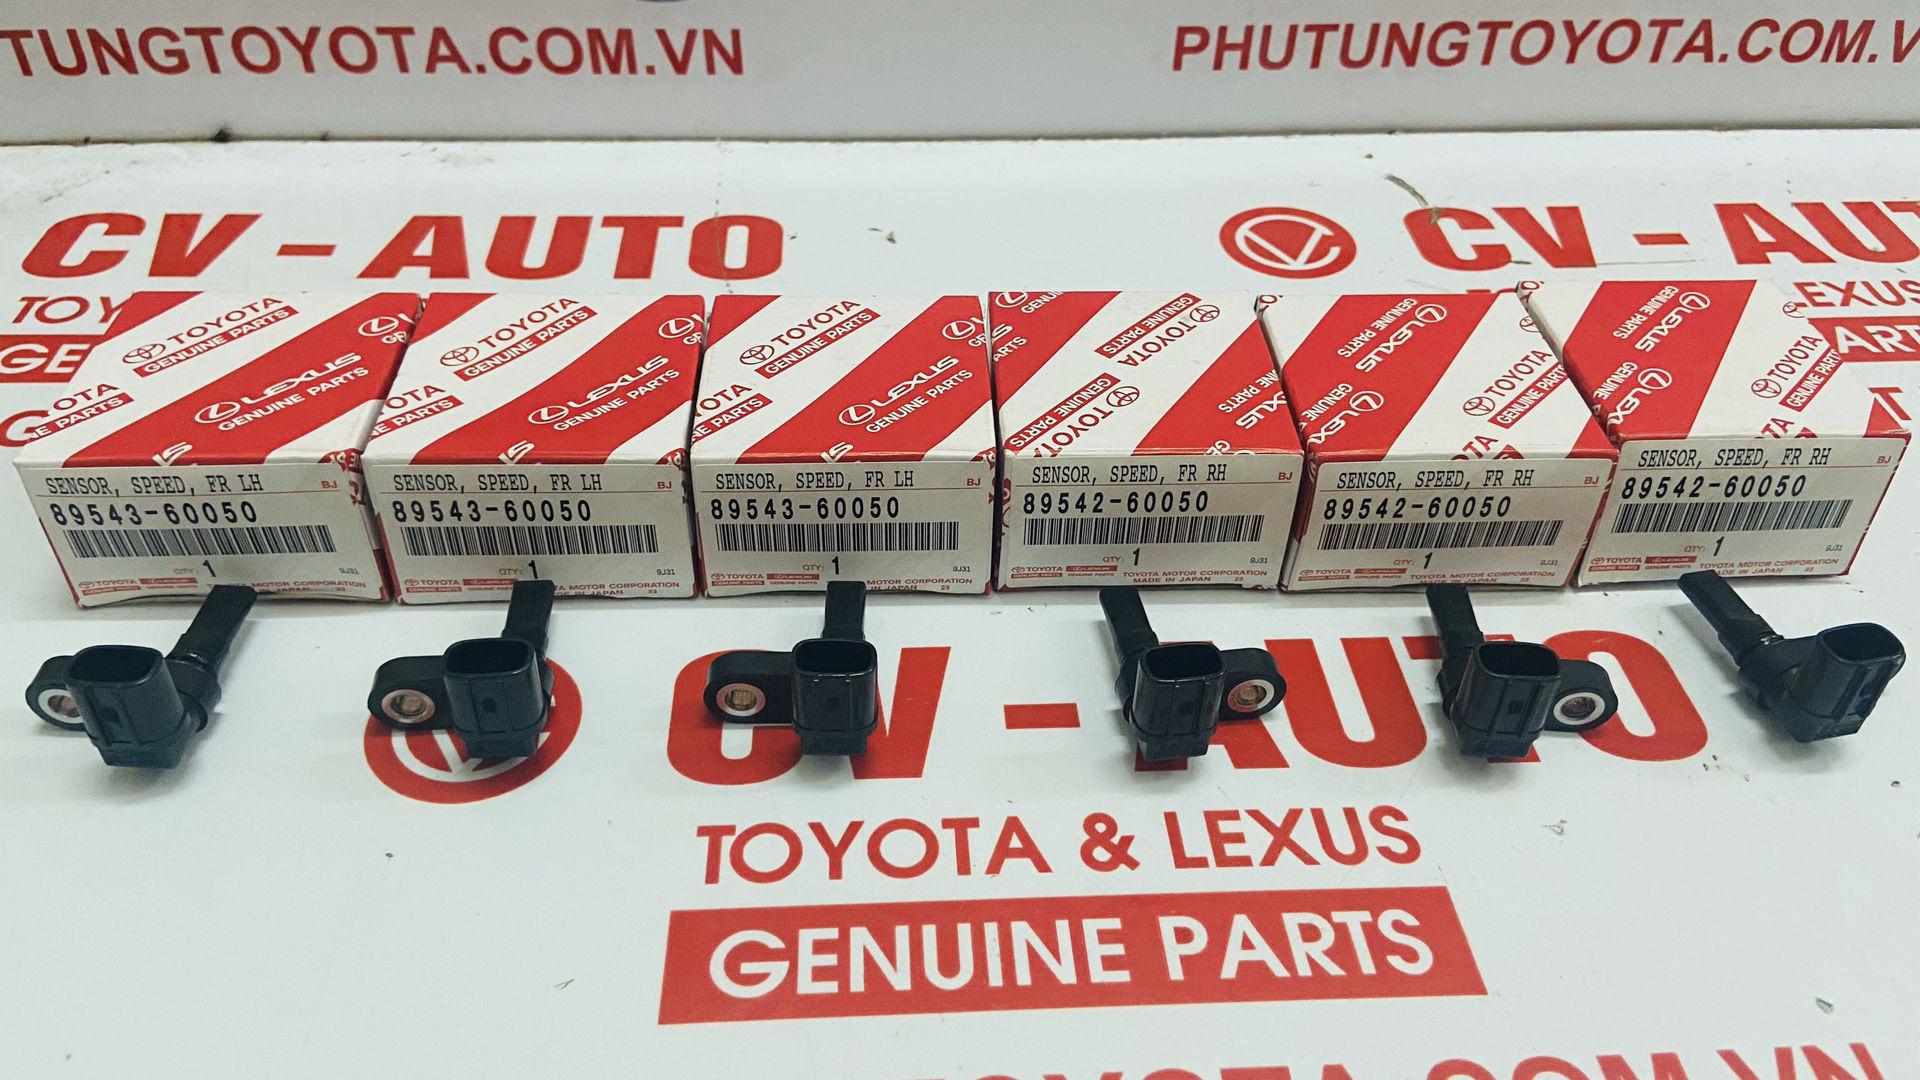 Picture of 89542-60050 89543-60050 Cảm biến ABS Toyota Prado Cruiser - Land Cruiser Prado, Lexus GX460 GX470 LX570